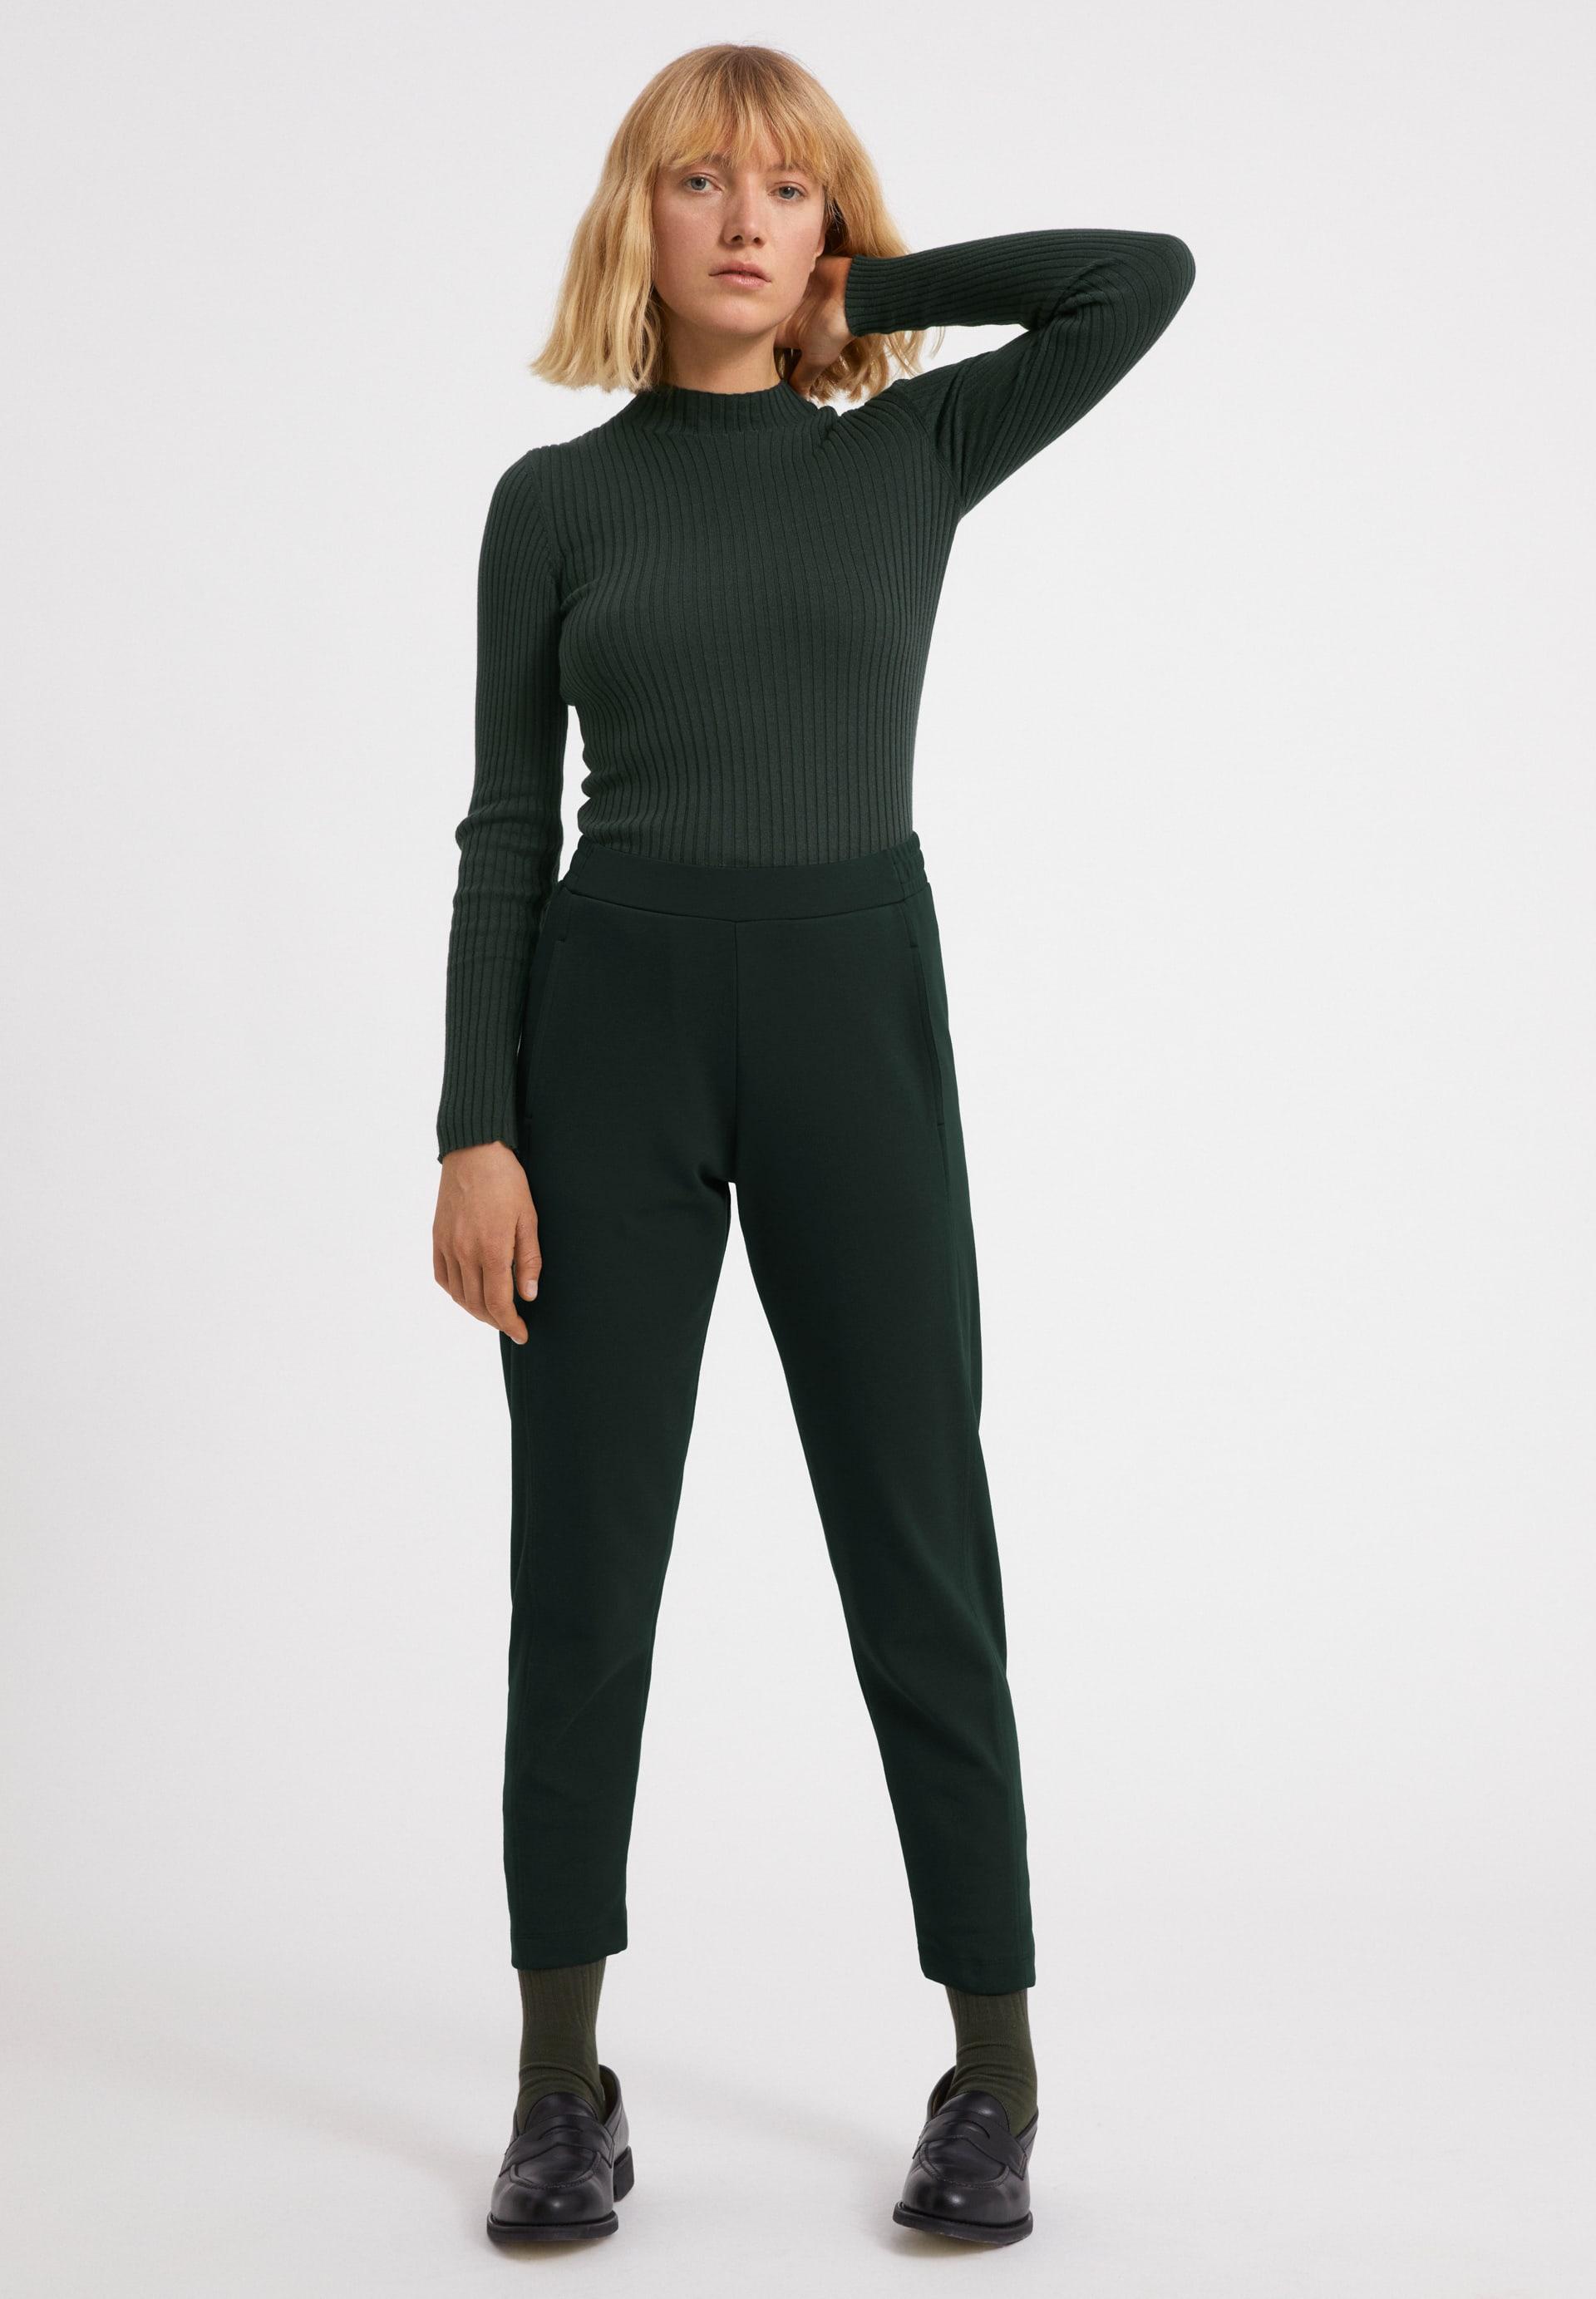 MAGDAA Jerseyhose aus LENZING™ ECOVERO™ Mix